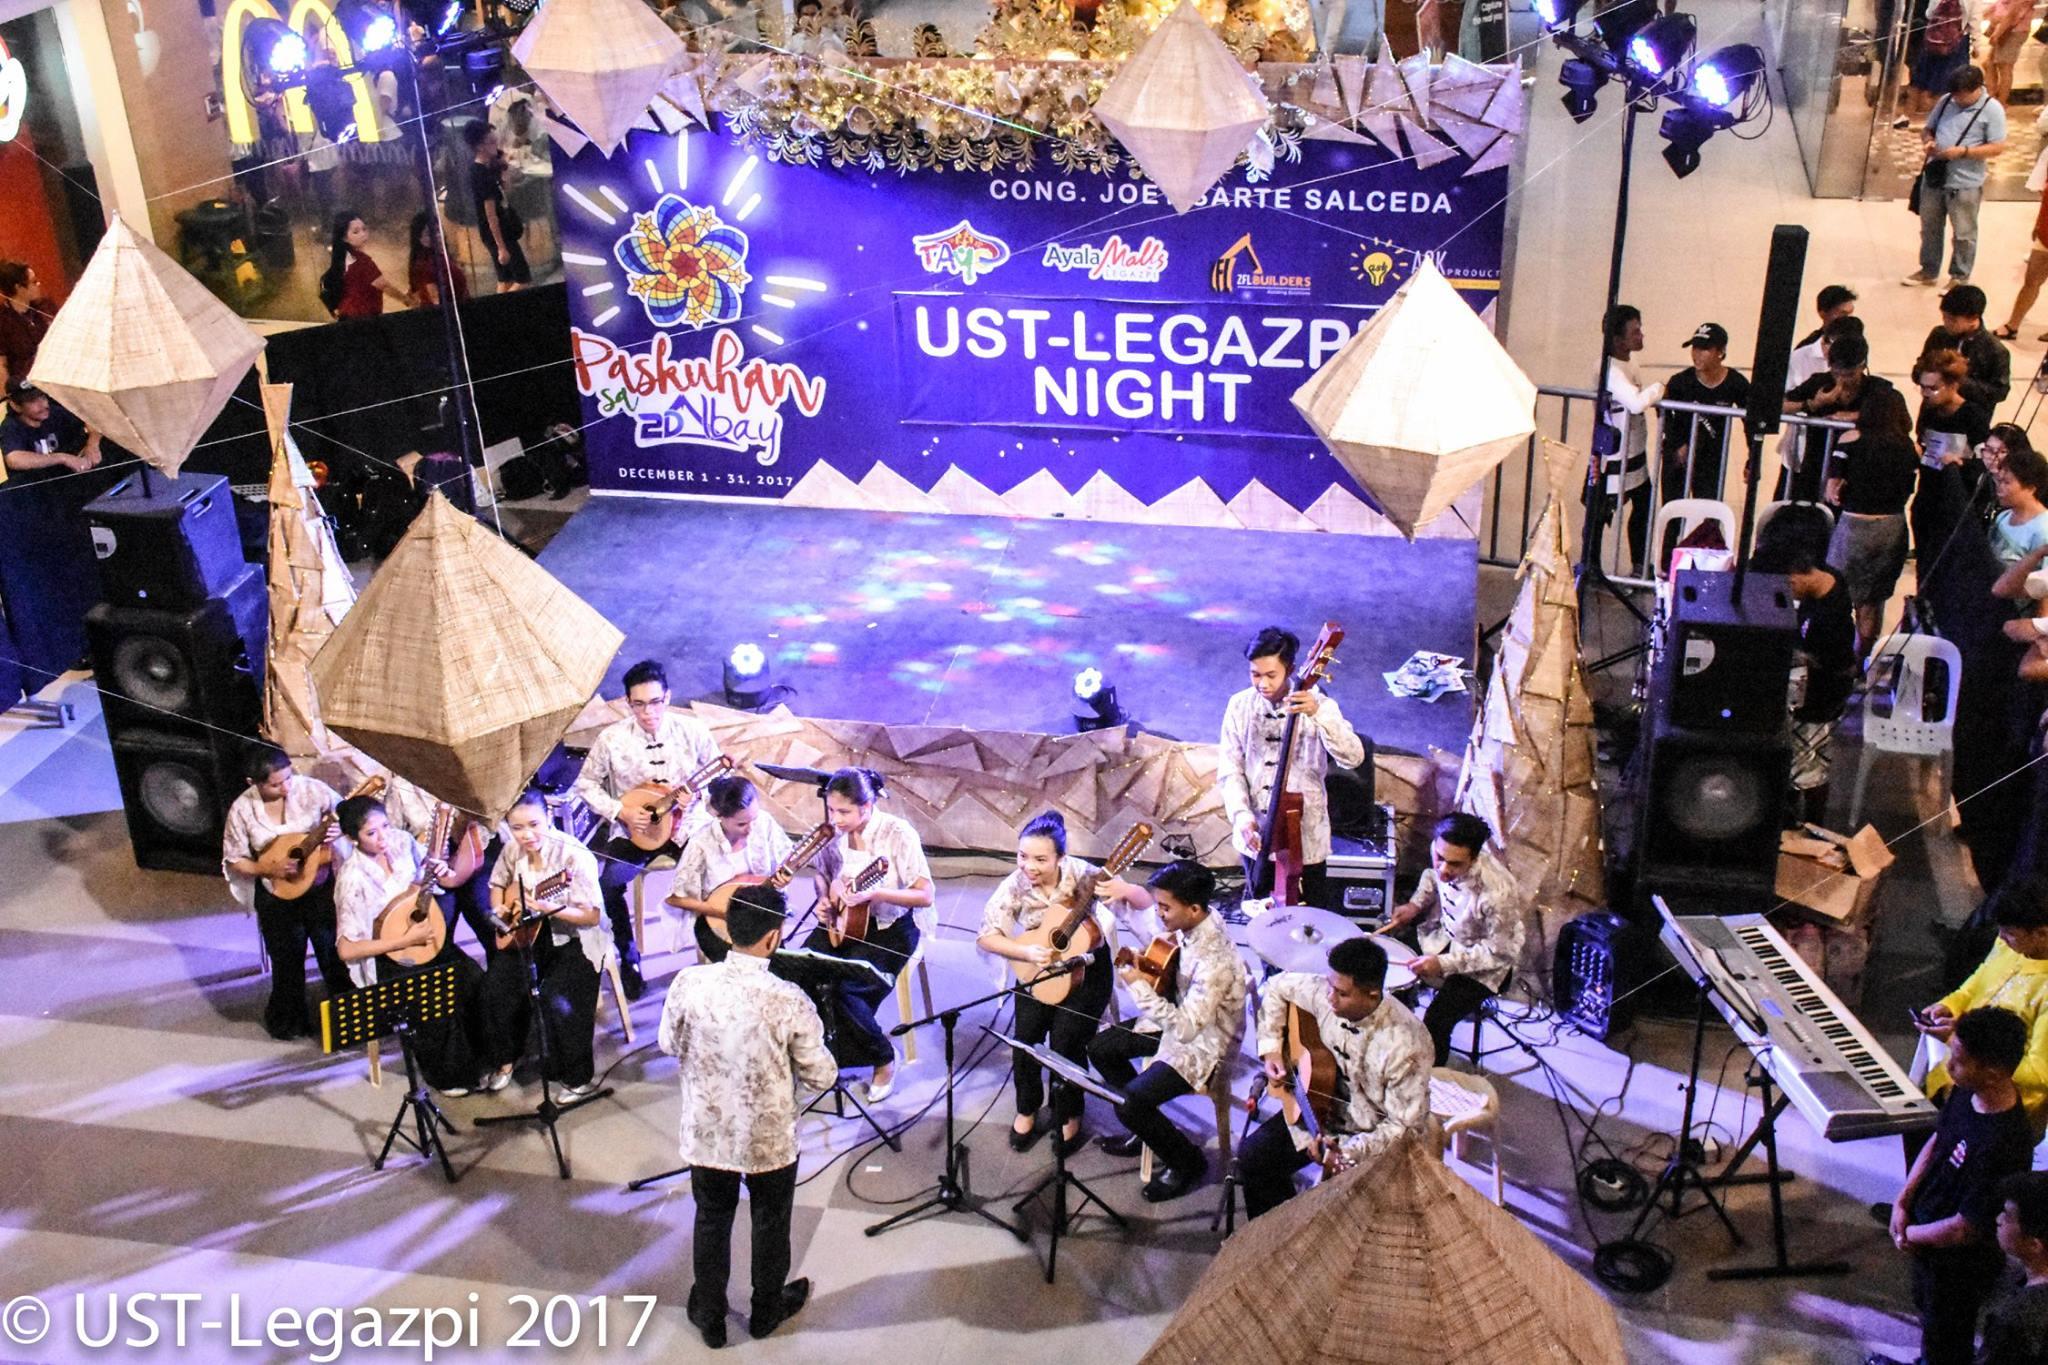 UST-Legazpi Night (Paskuhan sa 2D Albay 2017)